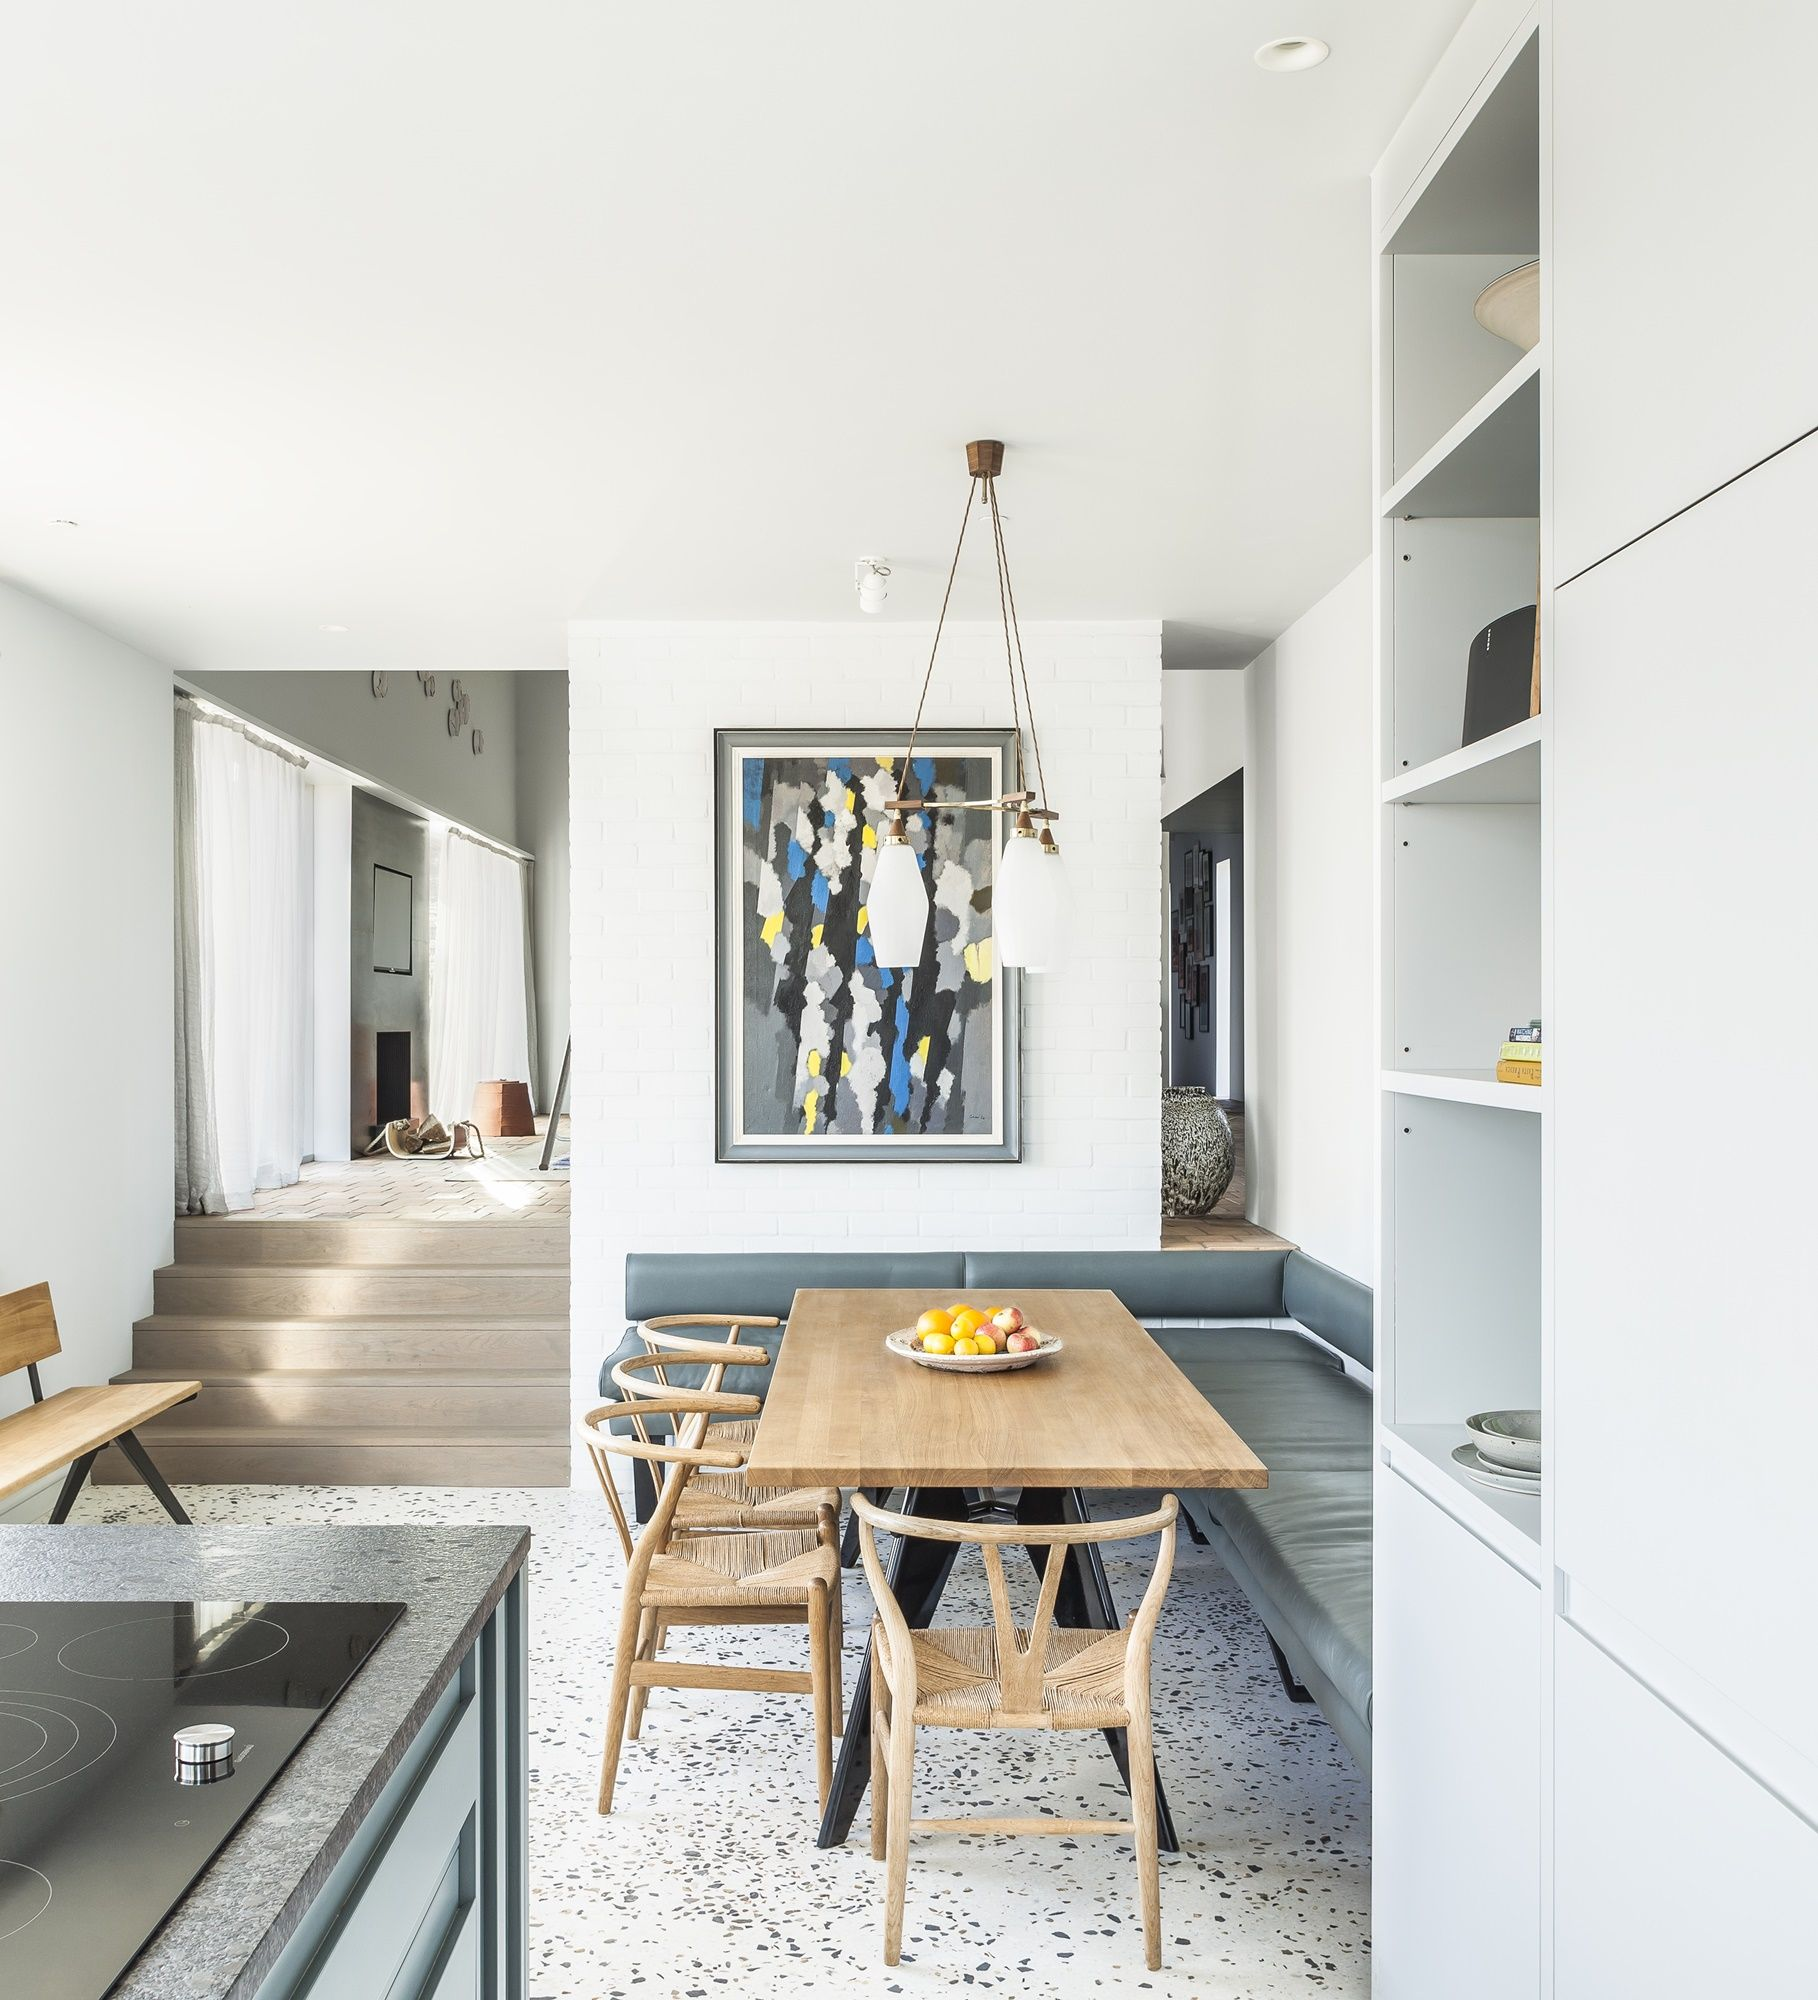 Küchenideen fliesenboden ebb and flow marsh hill by mole architects  terrazzo flooring